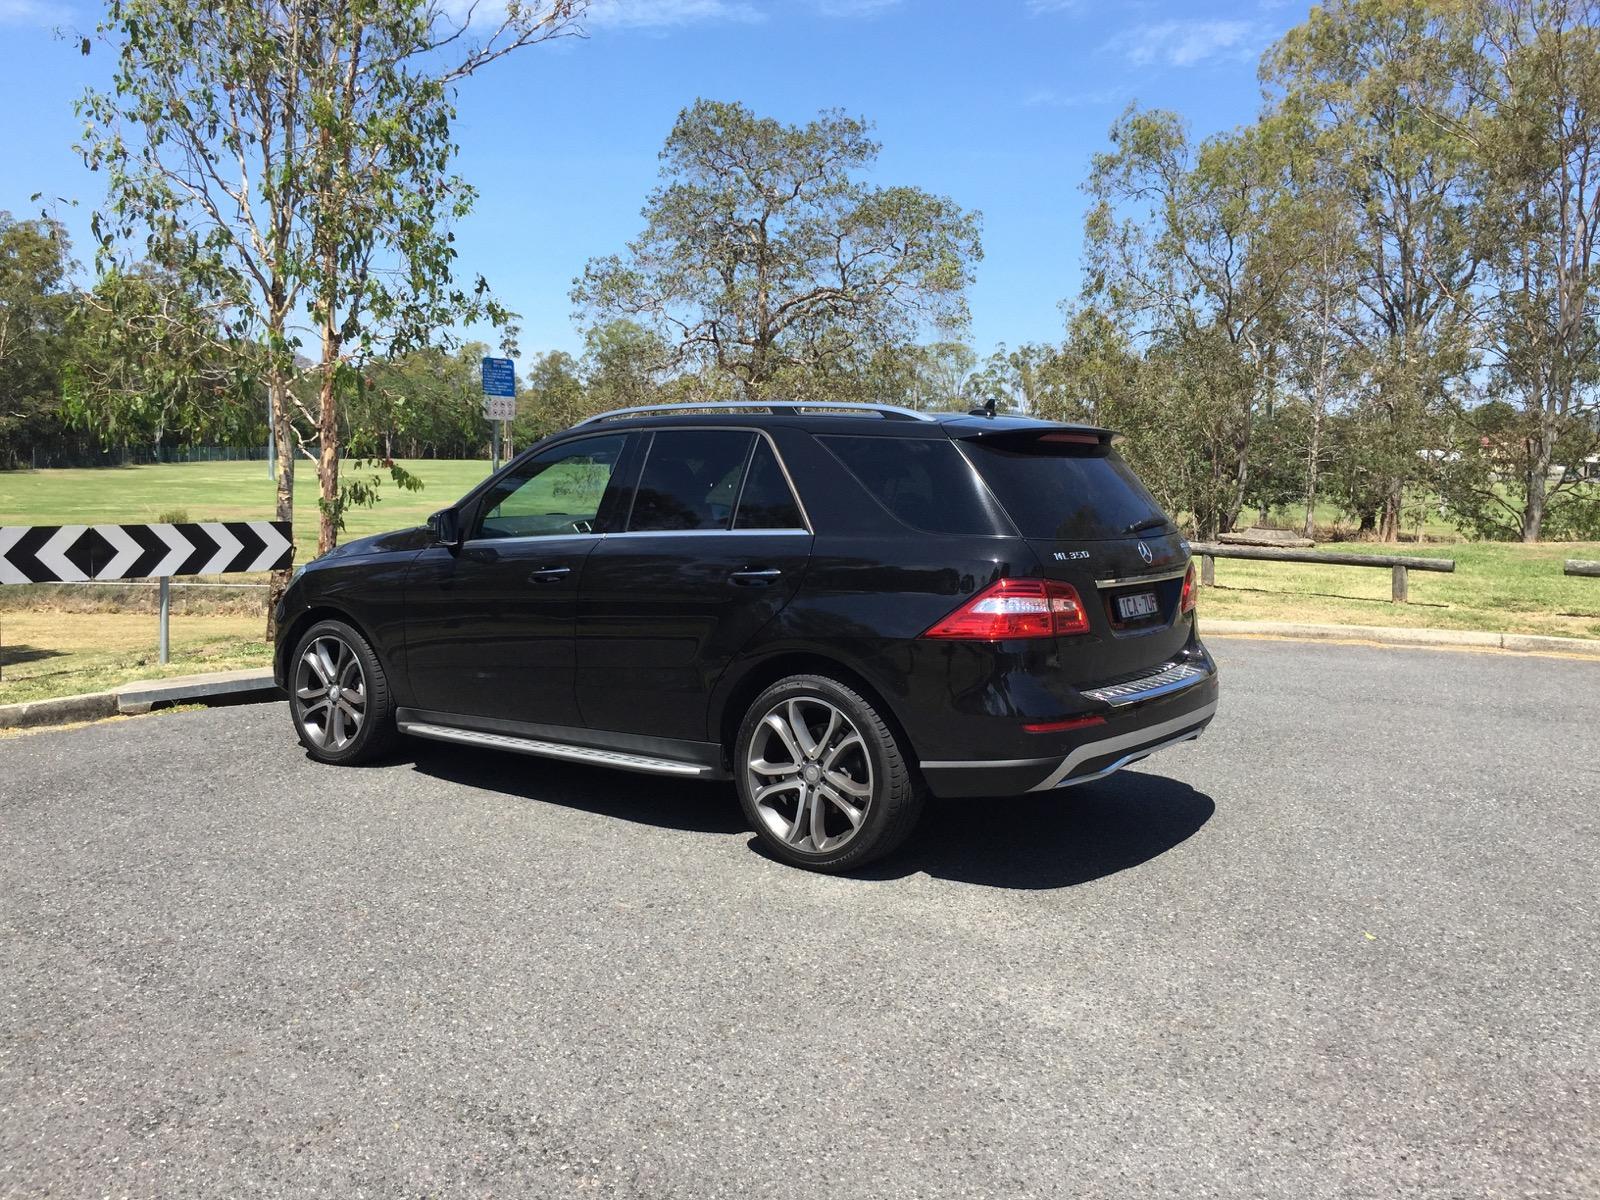 Mercedes-Benz ML 350 Review: LT2 | CarAdvice